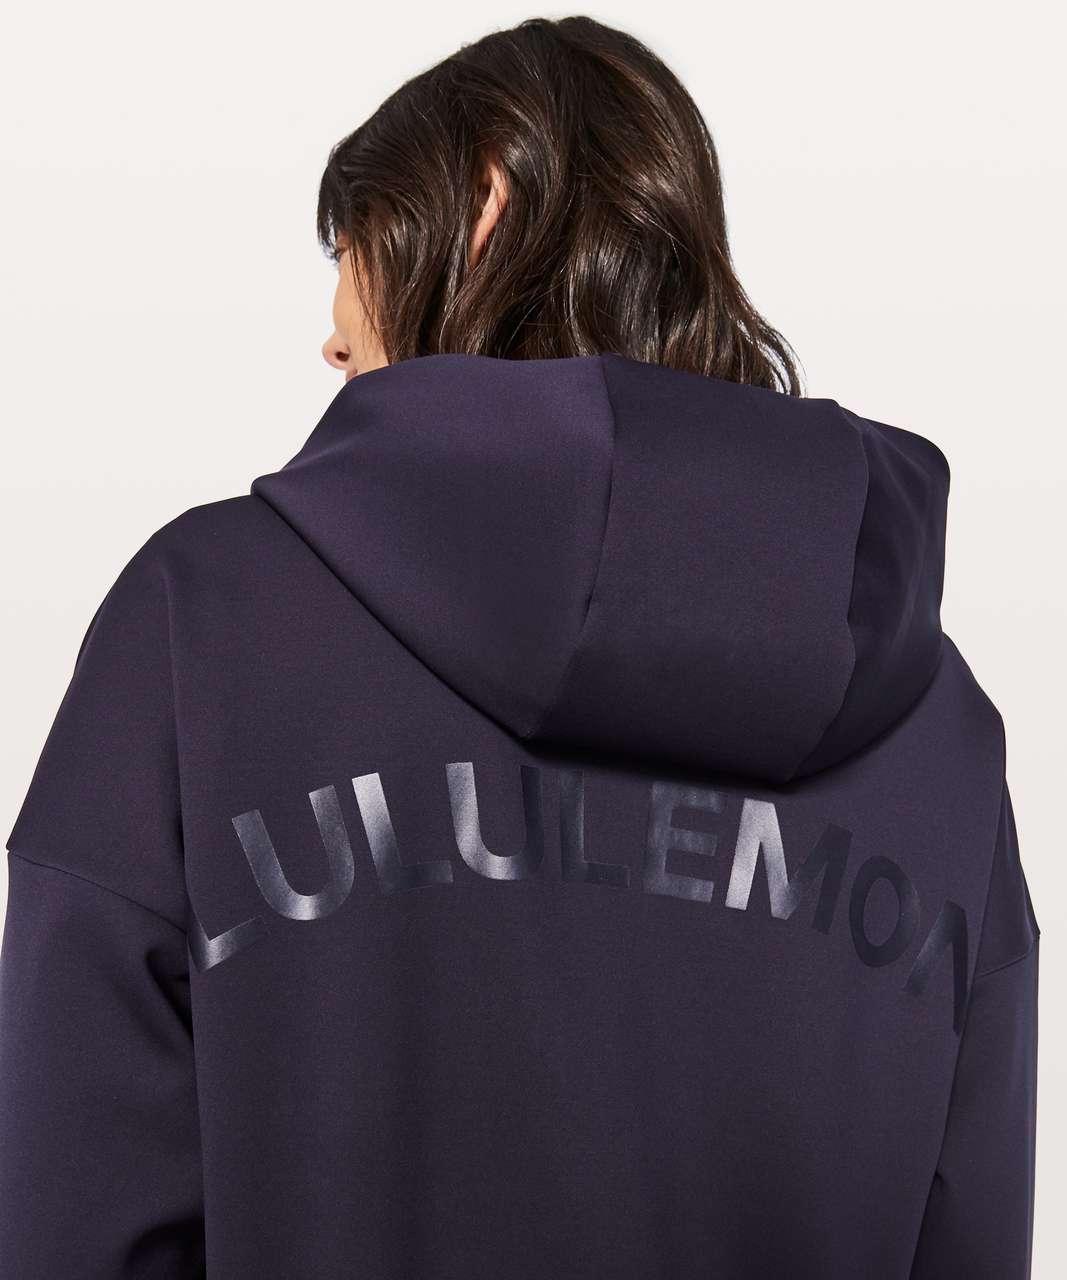 611fad7a608 Lululemon Shaped Jacket Expression - Midnight Navy - lulu fanatics